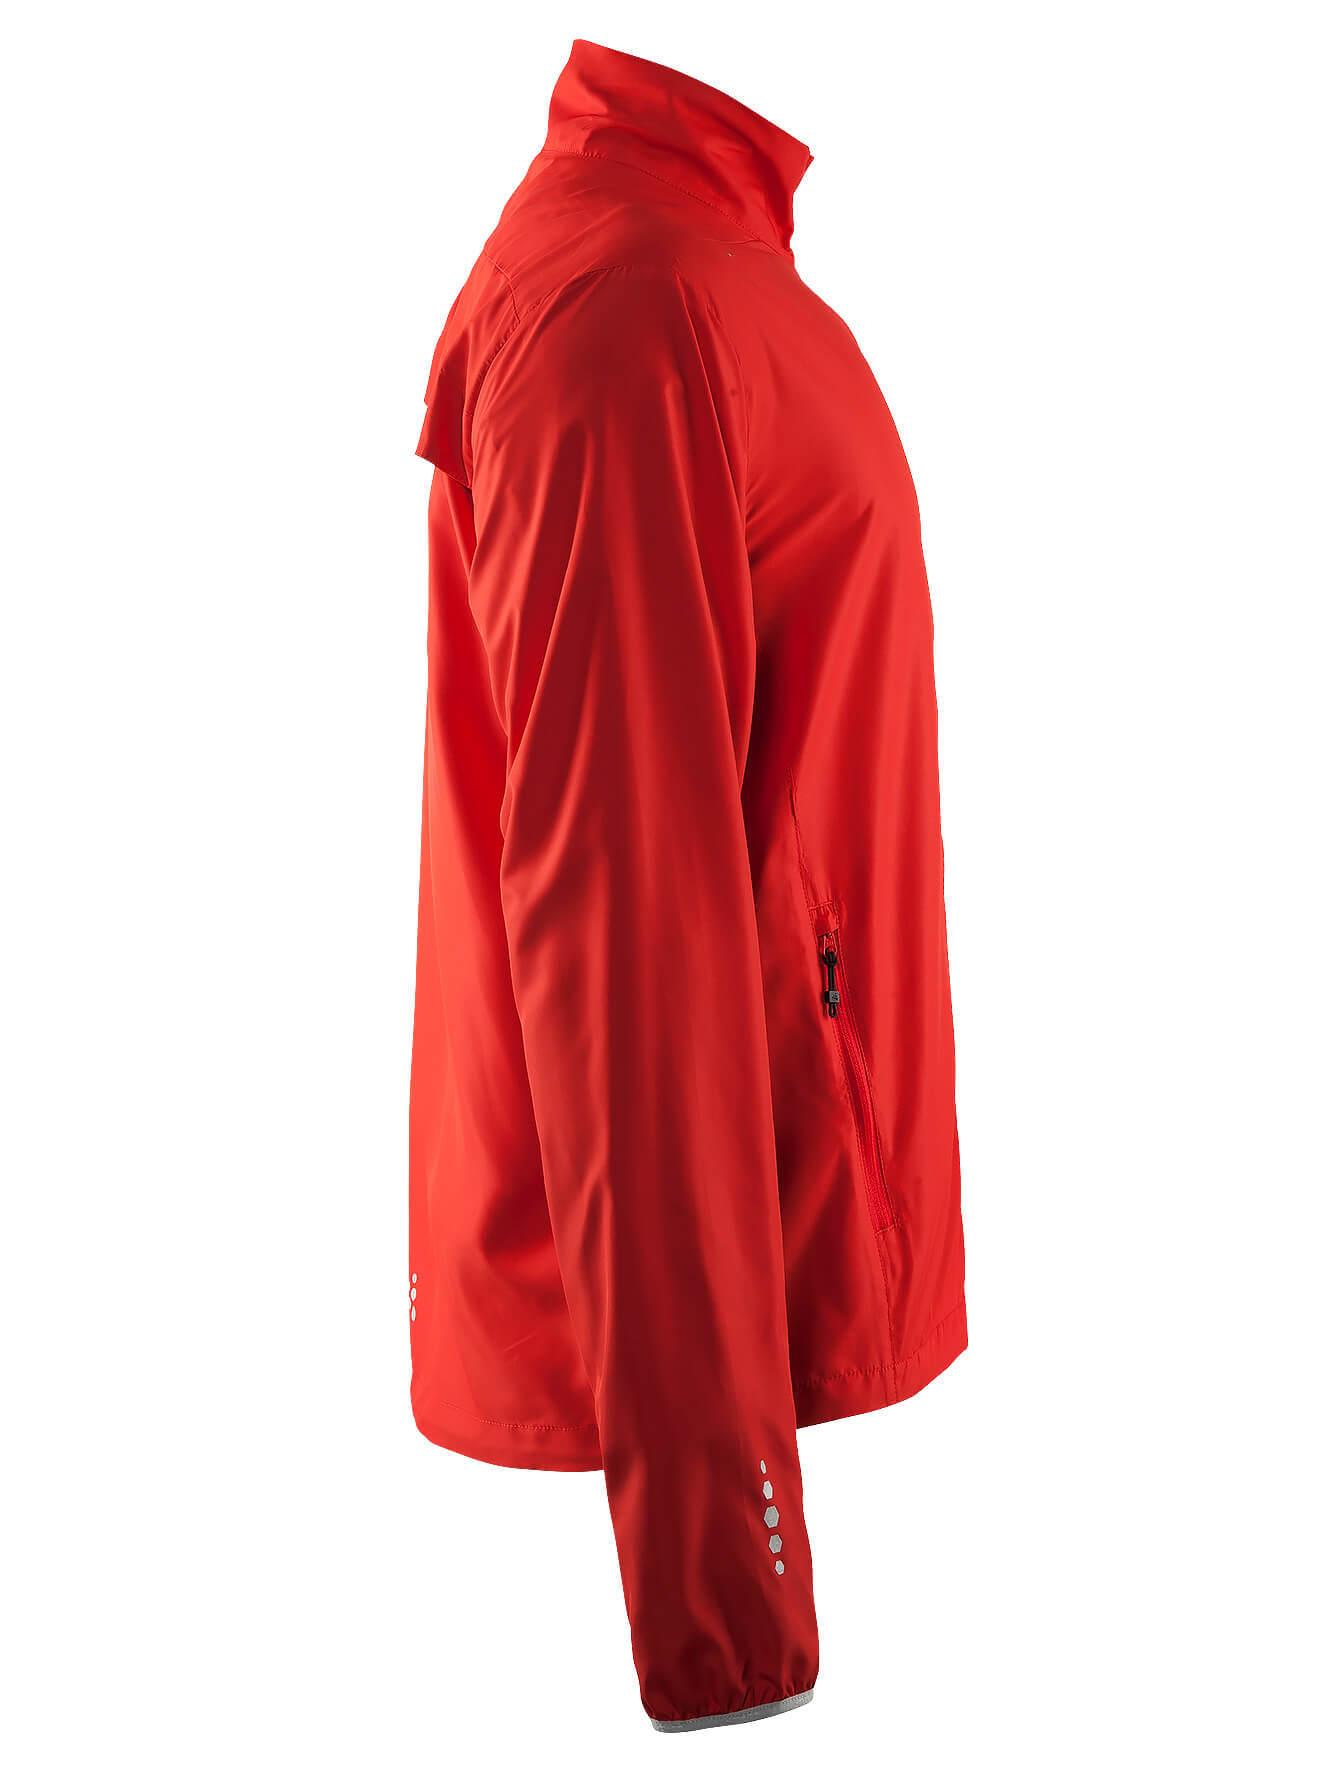 Craft Mind Run мужская беговая куртка Red - 3